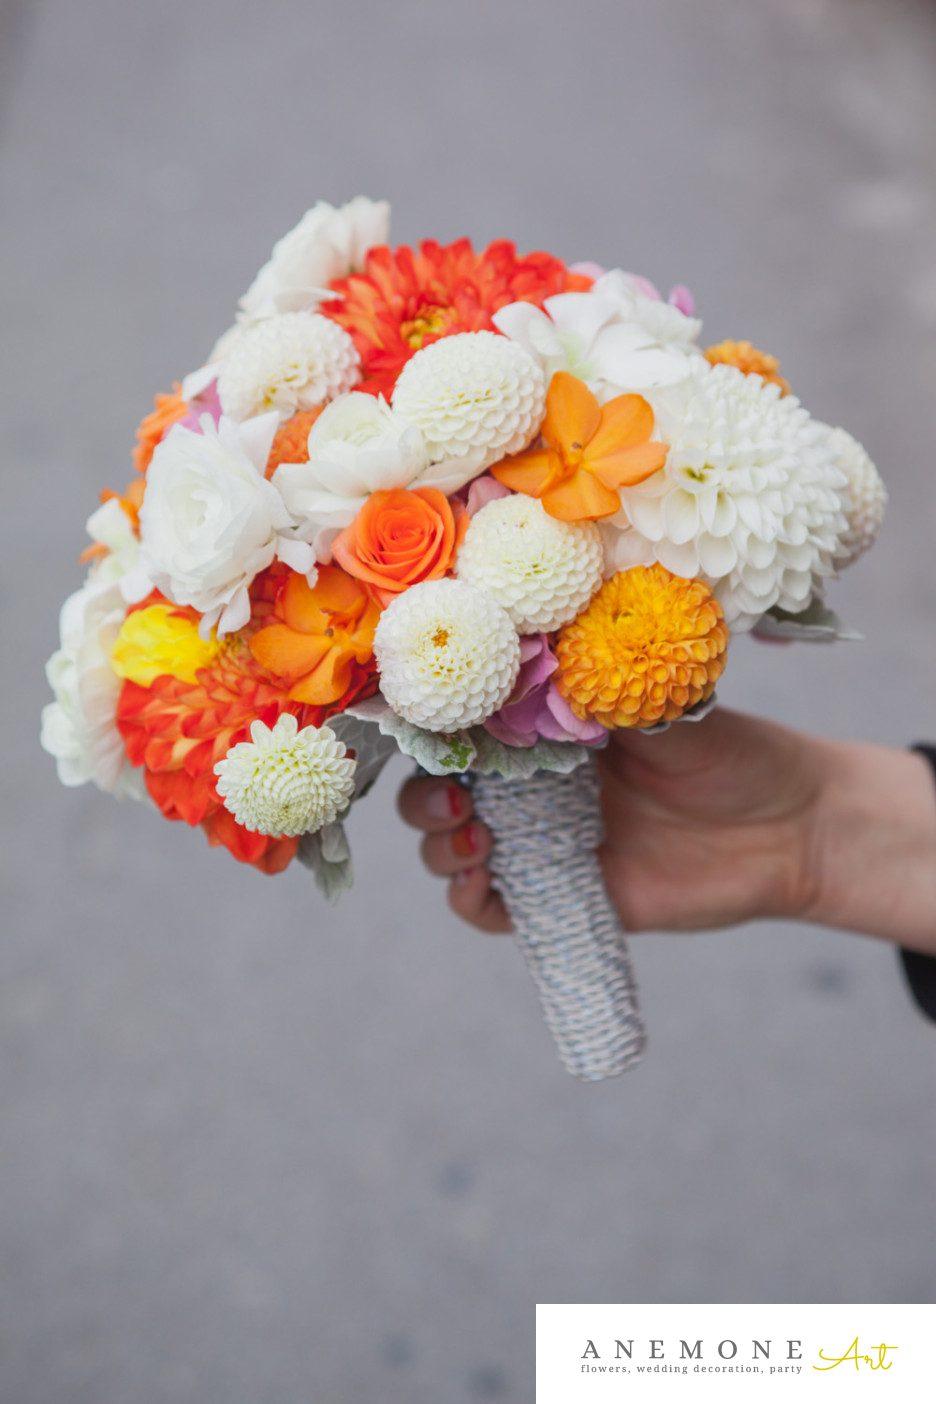 Poza, foto cu Flori de nunta buchet mireasa, dalia, orhidee, portocaliu in Arad, Timisoara, Oradea (wedding flowers, bouquets) nunta Arad, Timisoara, Oradea